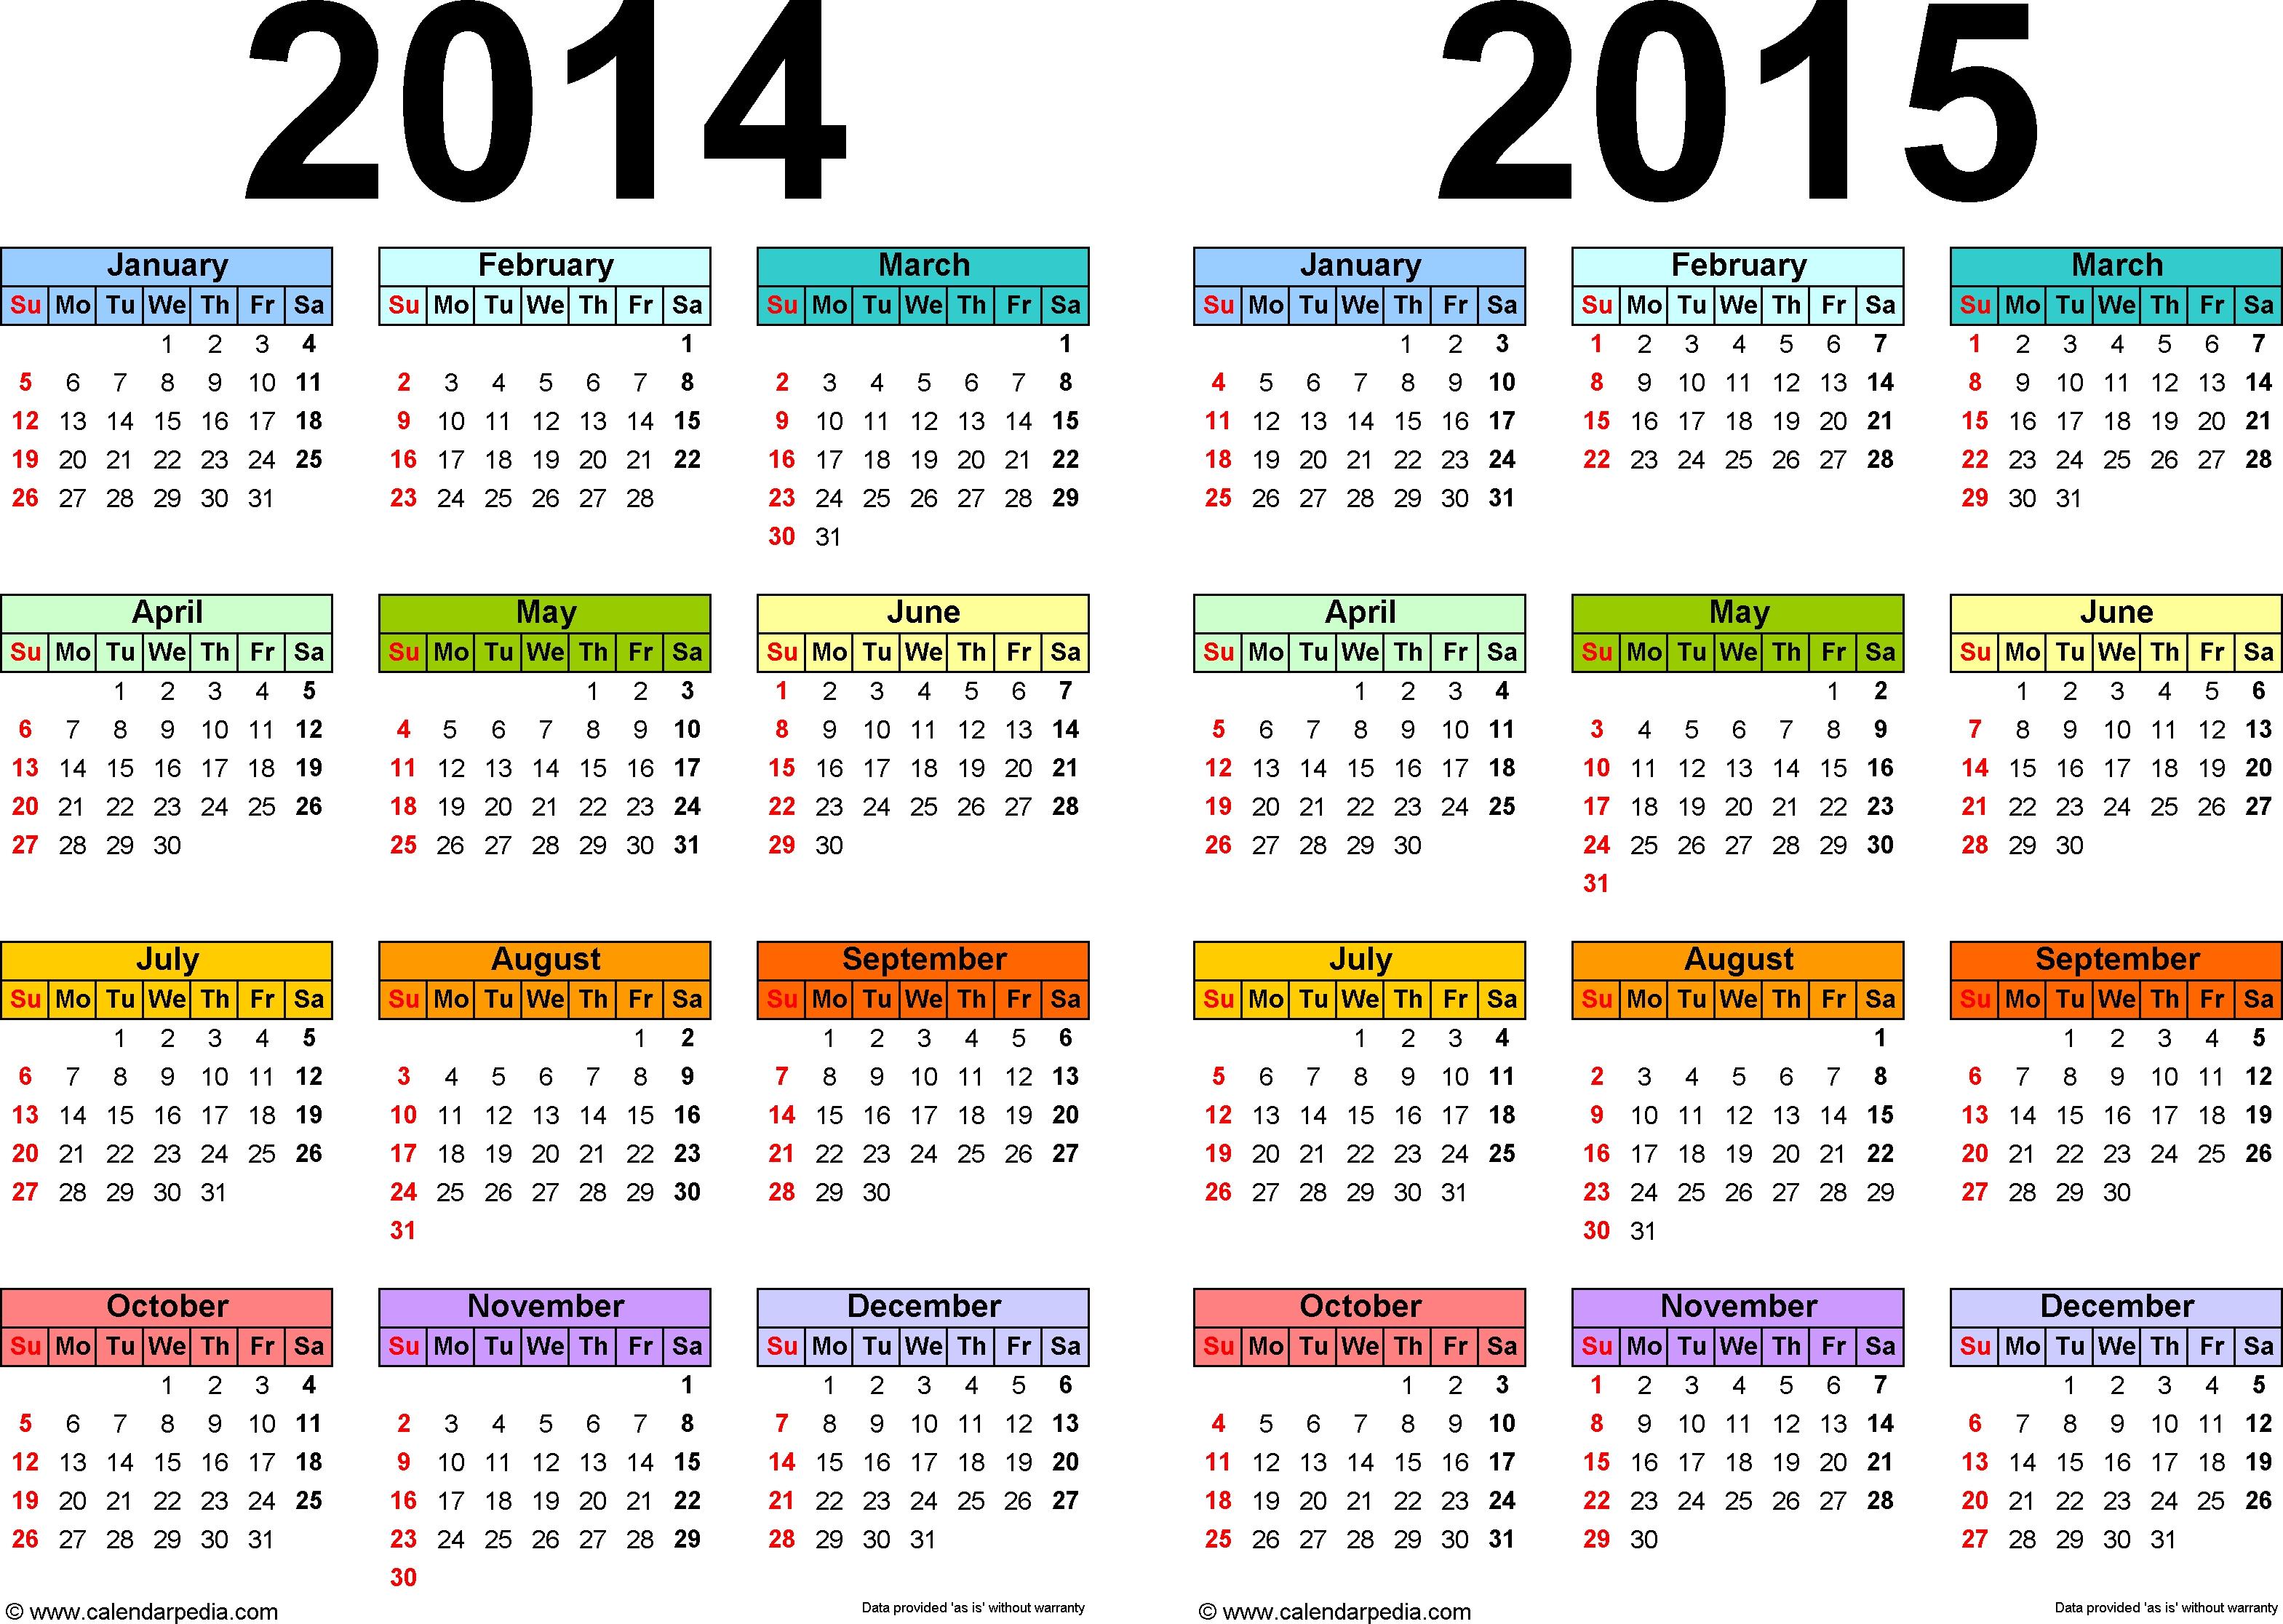 2014-2015 Calendar - Free Printable Two-Year Pdf Calendars  Printable Yearly Calendar 2014 2015